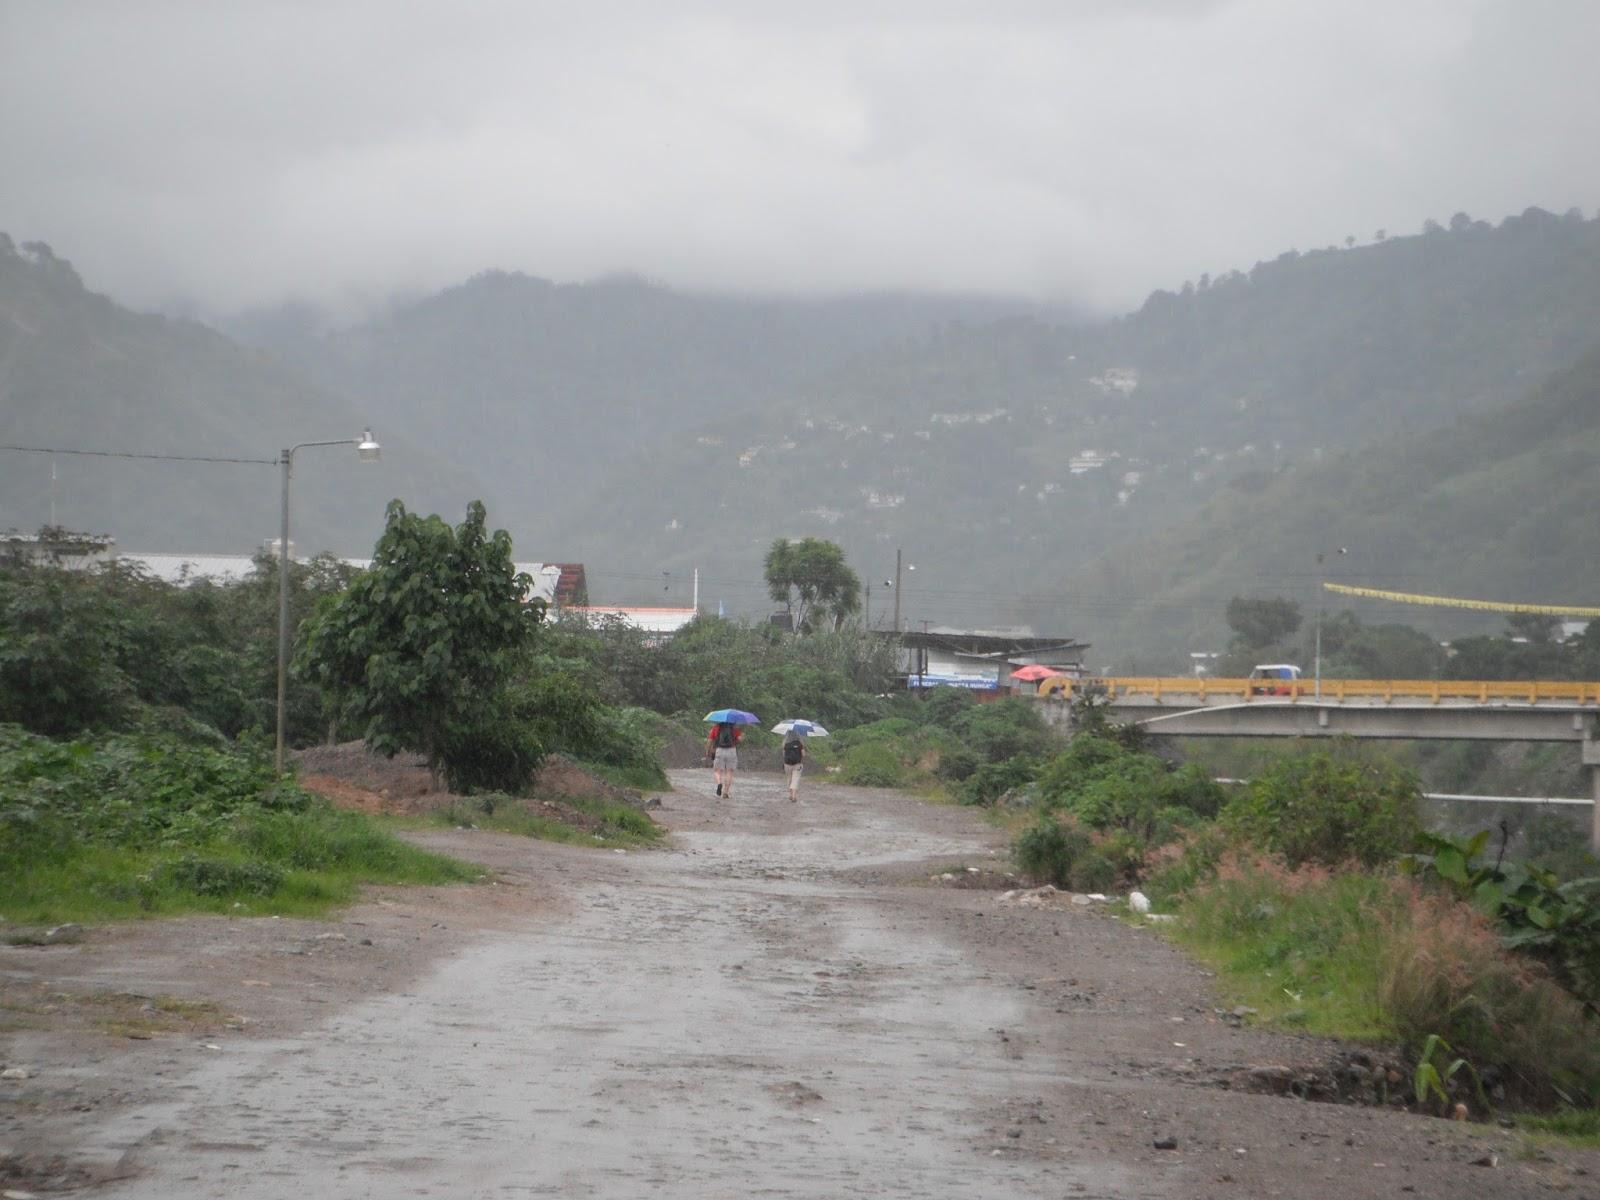 Chasing Marbles Rainy Season Travel Tips For Guatemala